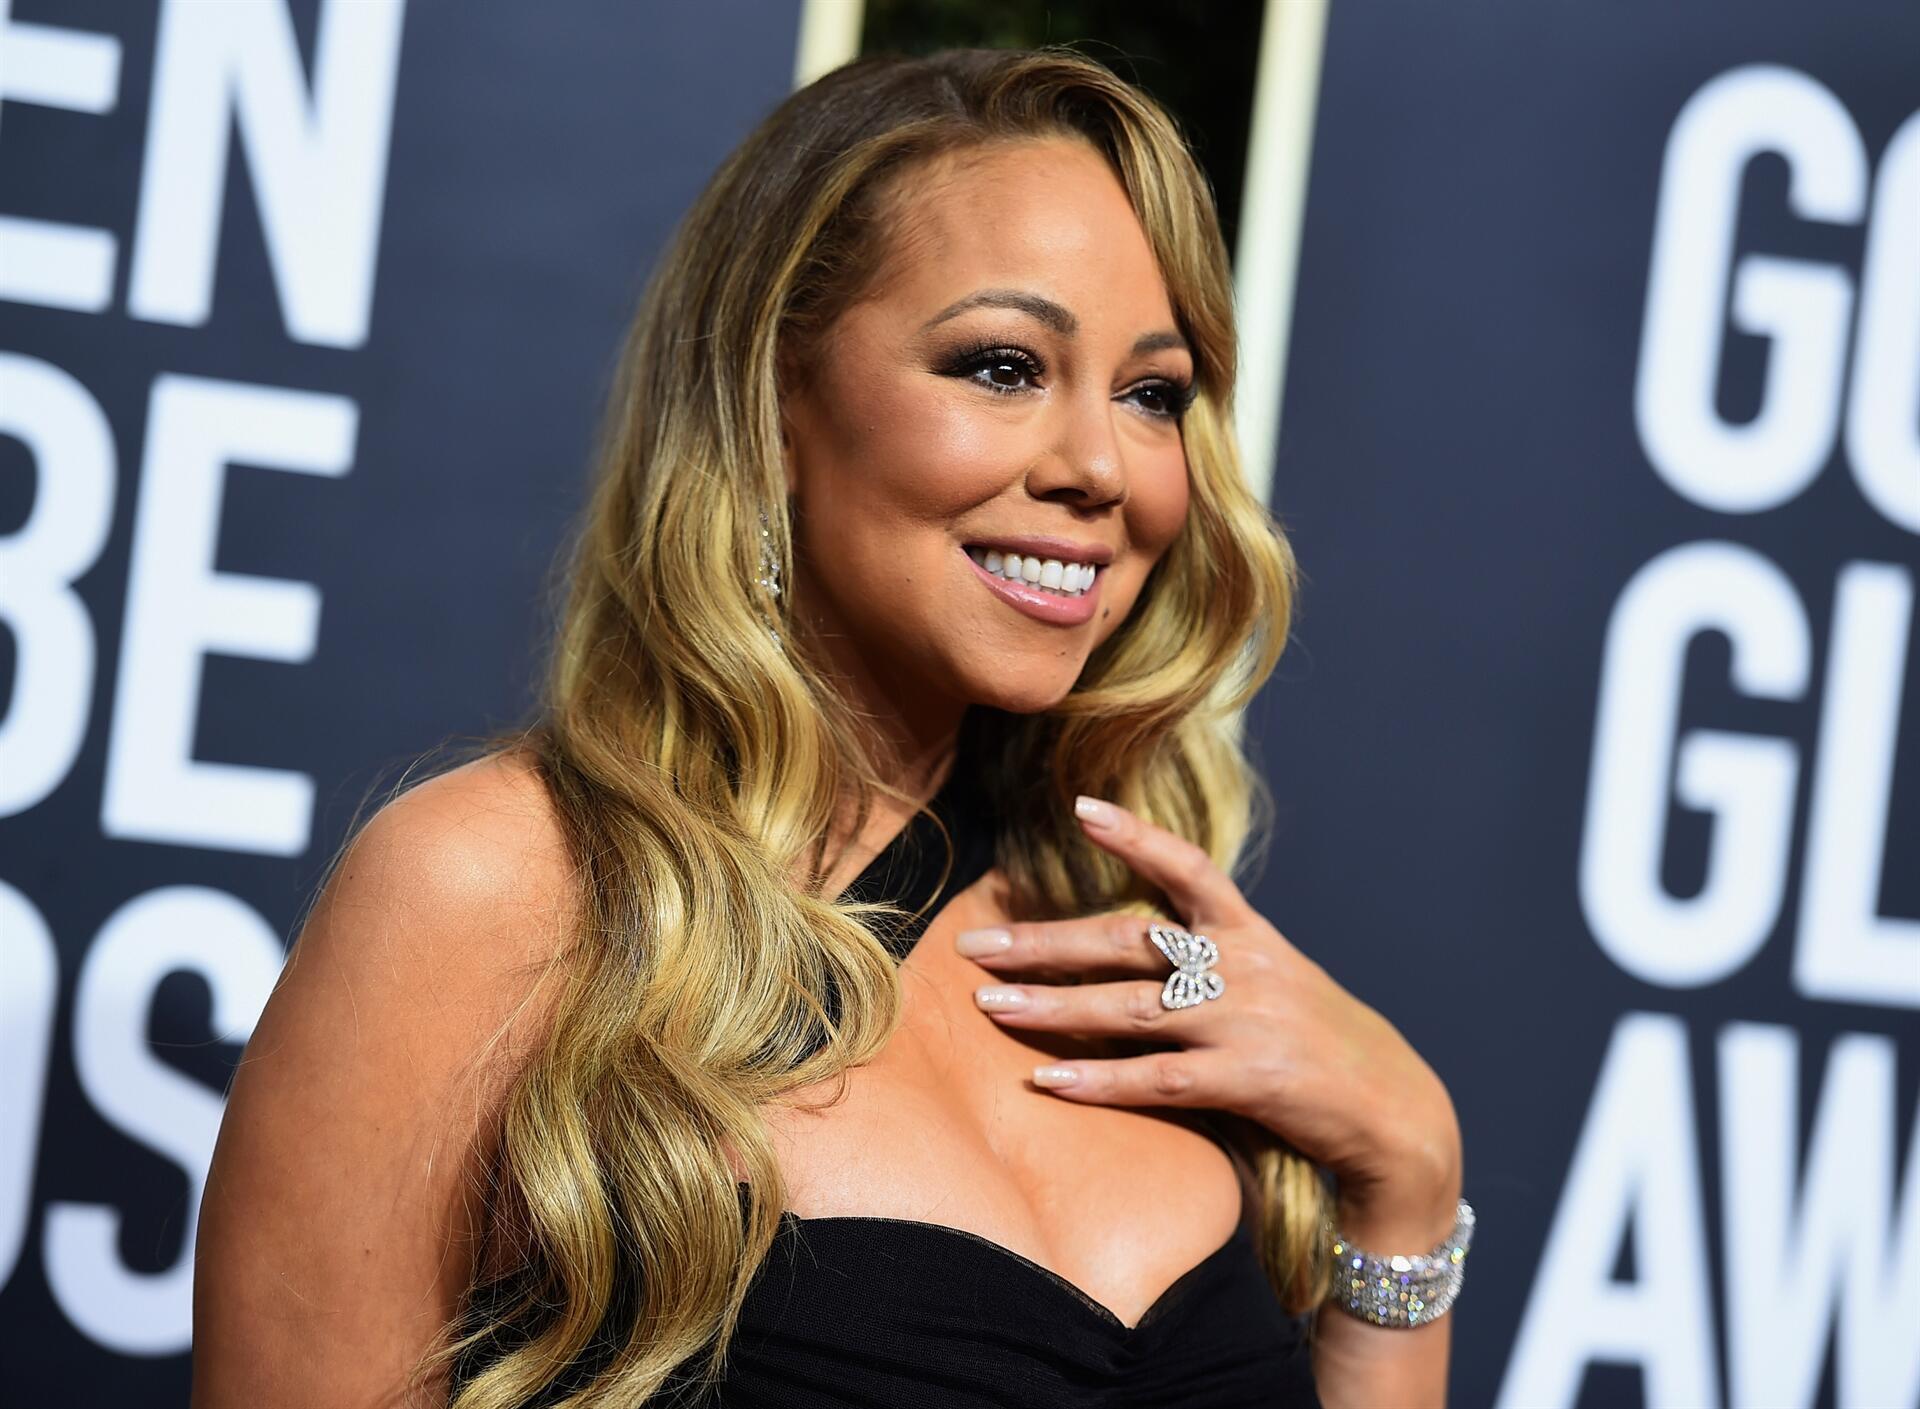 Mariah Carey Just Revealed Shes Bipolar: What Is Bipolar II Disorder